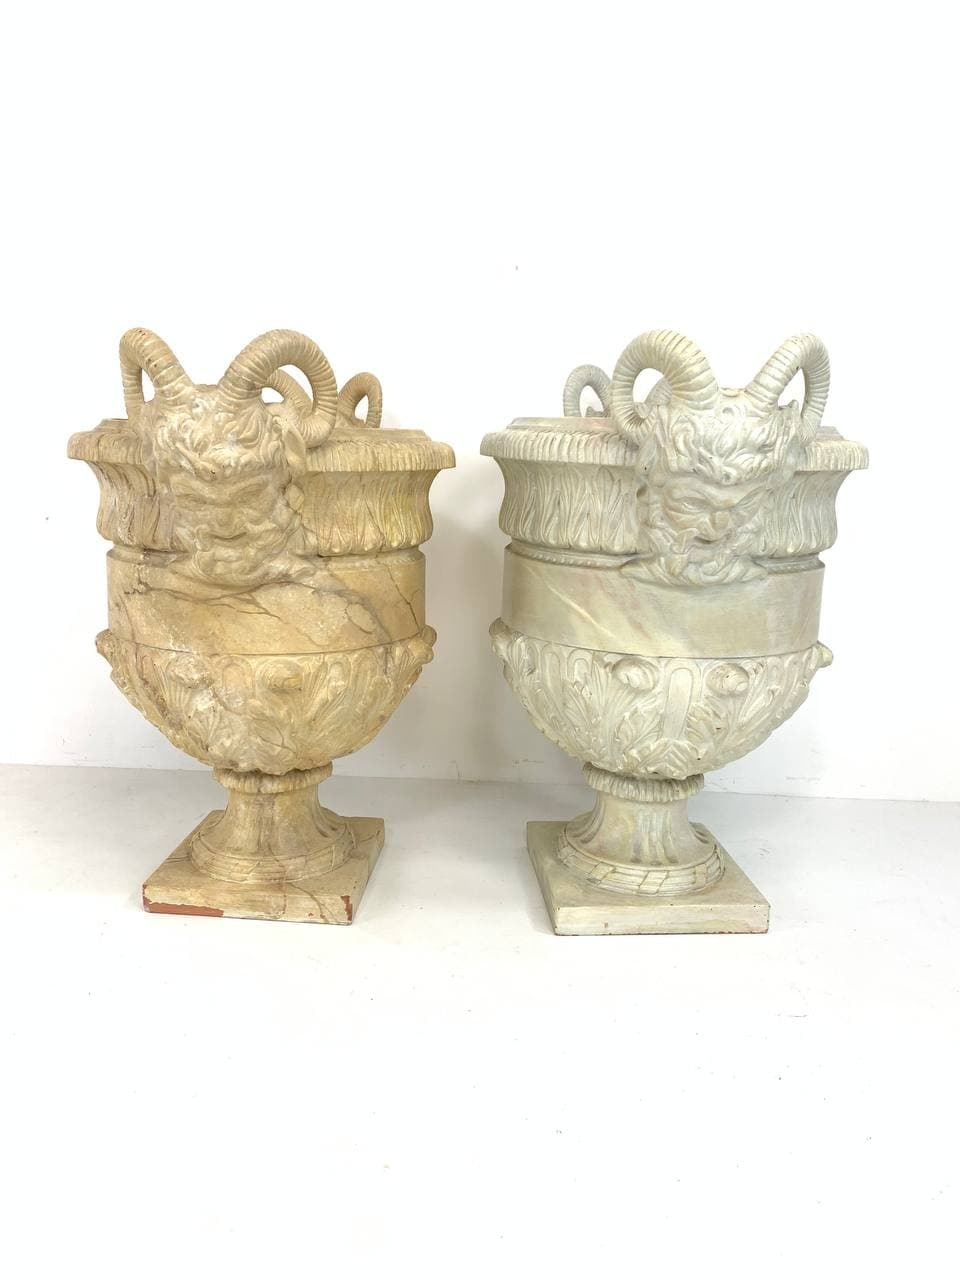 Антикварная пара горшков в стиле Ренессанс